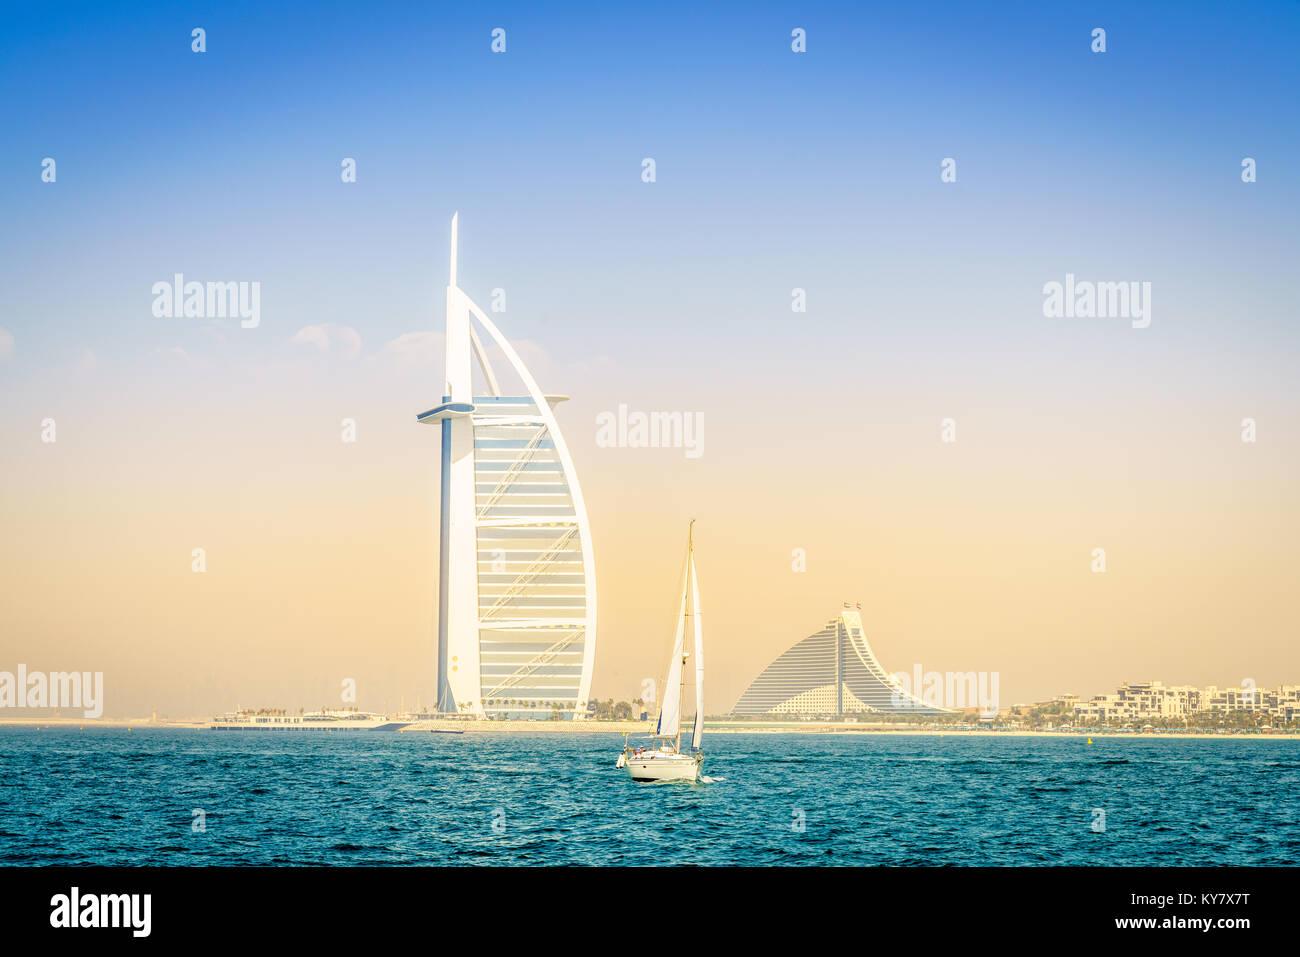 Dubai, UAE, March 31, 2017: seaside view of world's famous Burj Al Arab and Jumeirah Beach hotels - Stock Image